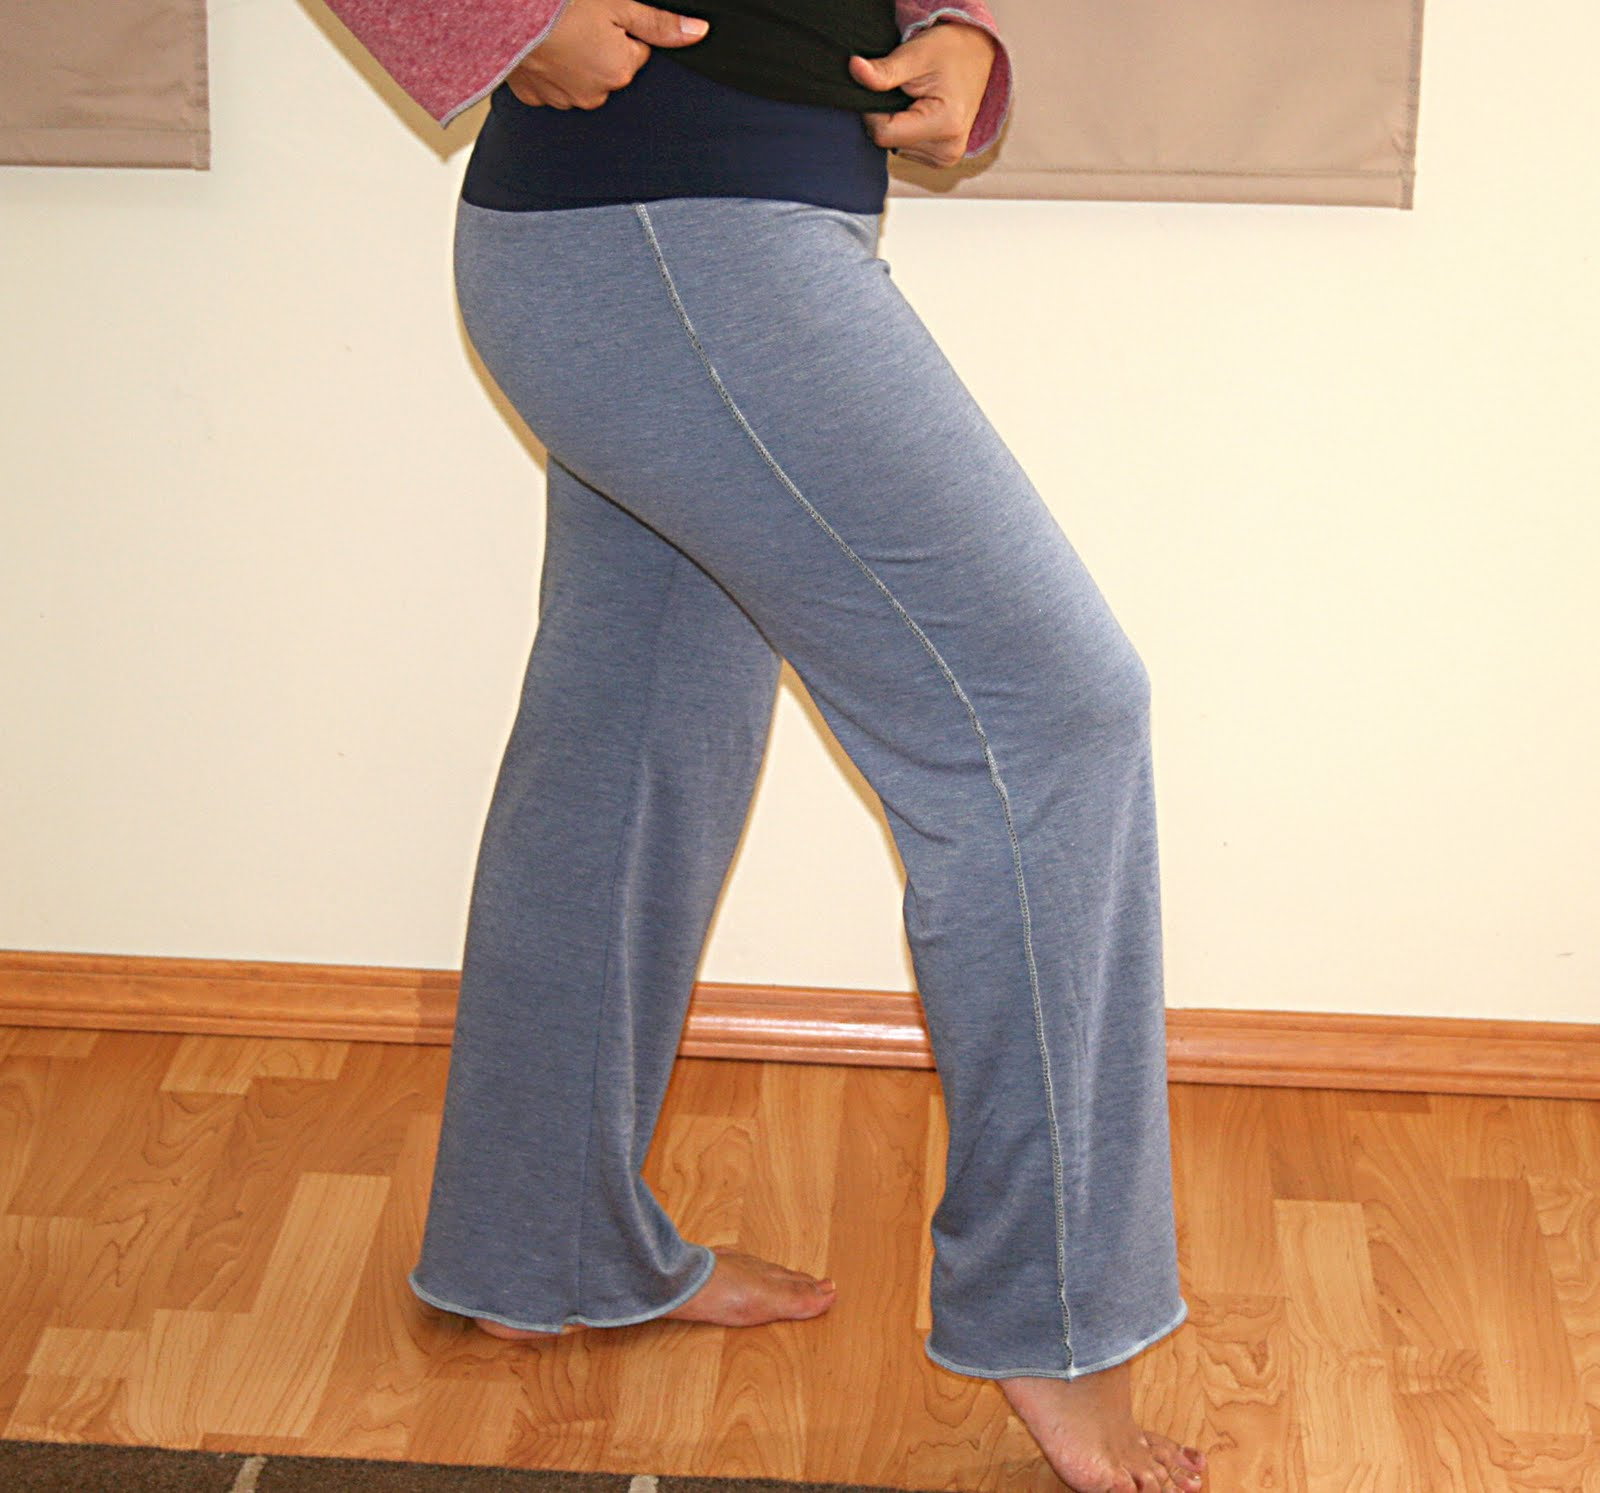 Miabambinaco: YOGA PANTS PDF PATTERN FOR LADIES